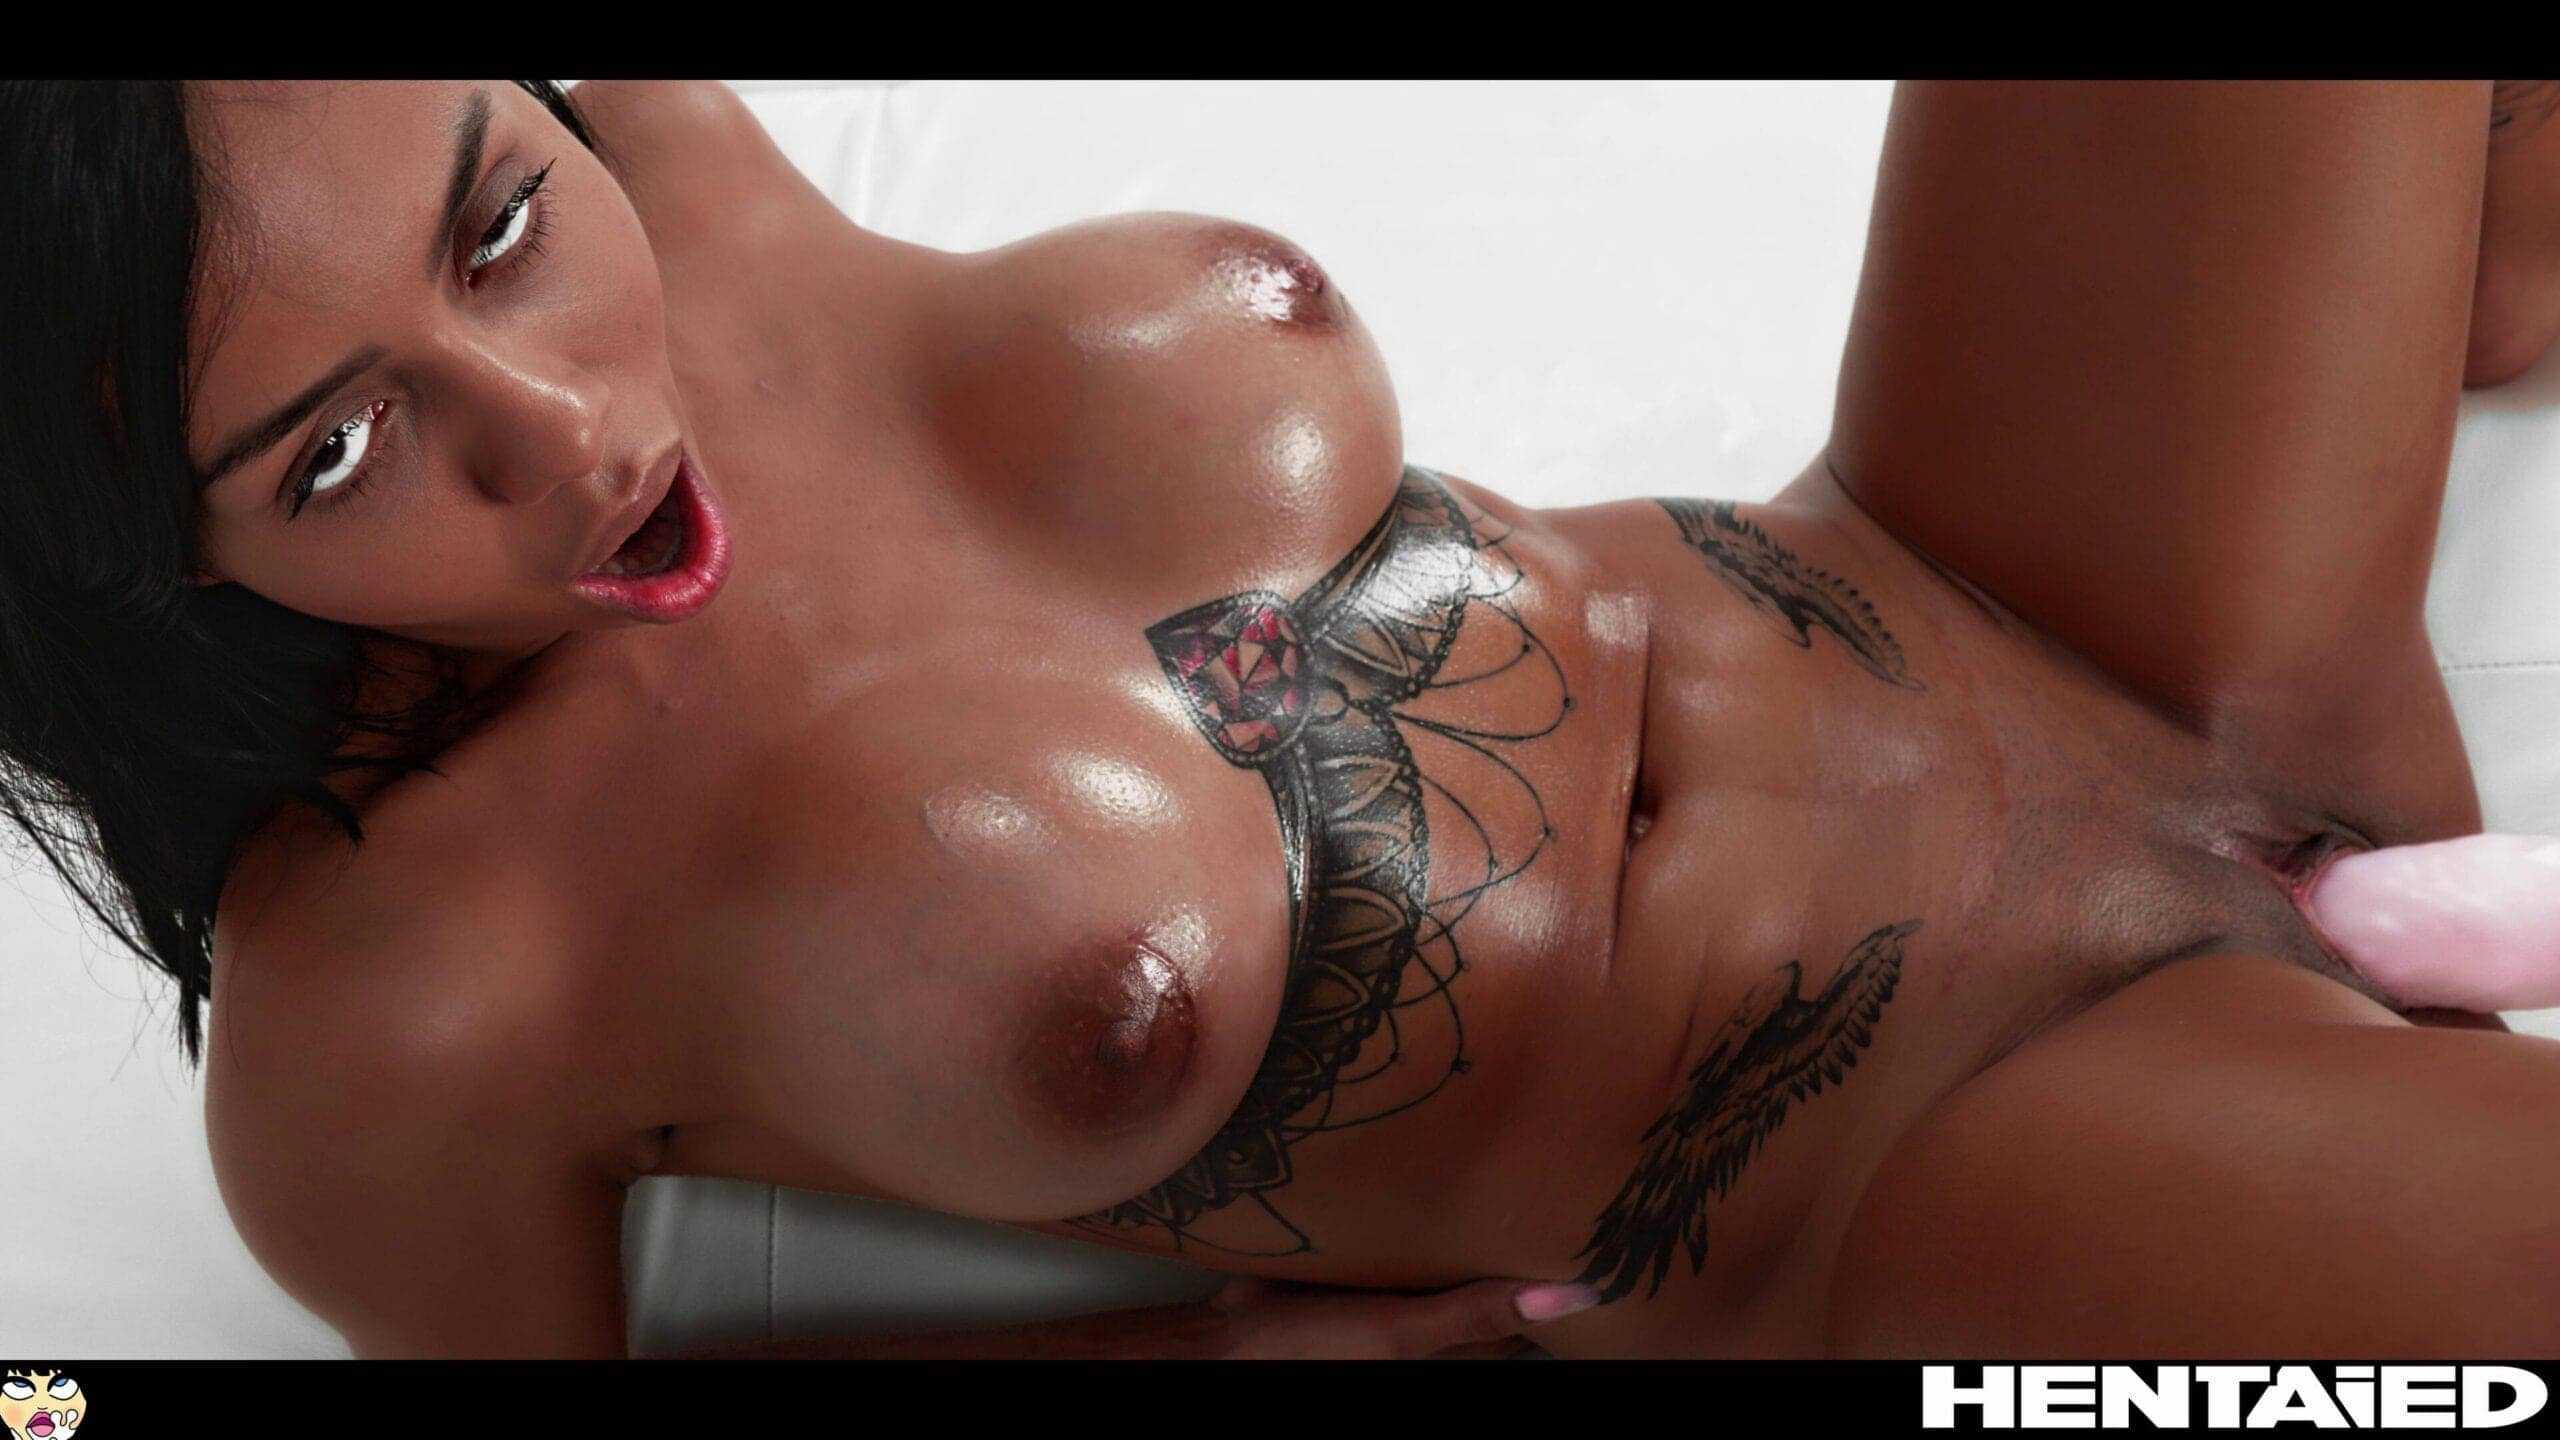 Canela Skin tattood pornstar dildo in pussy